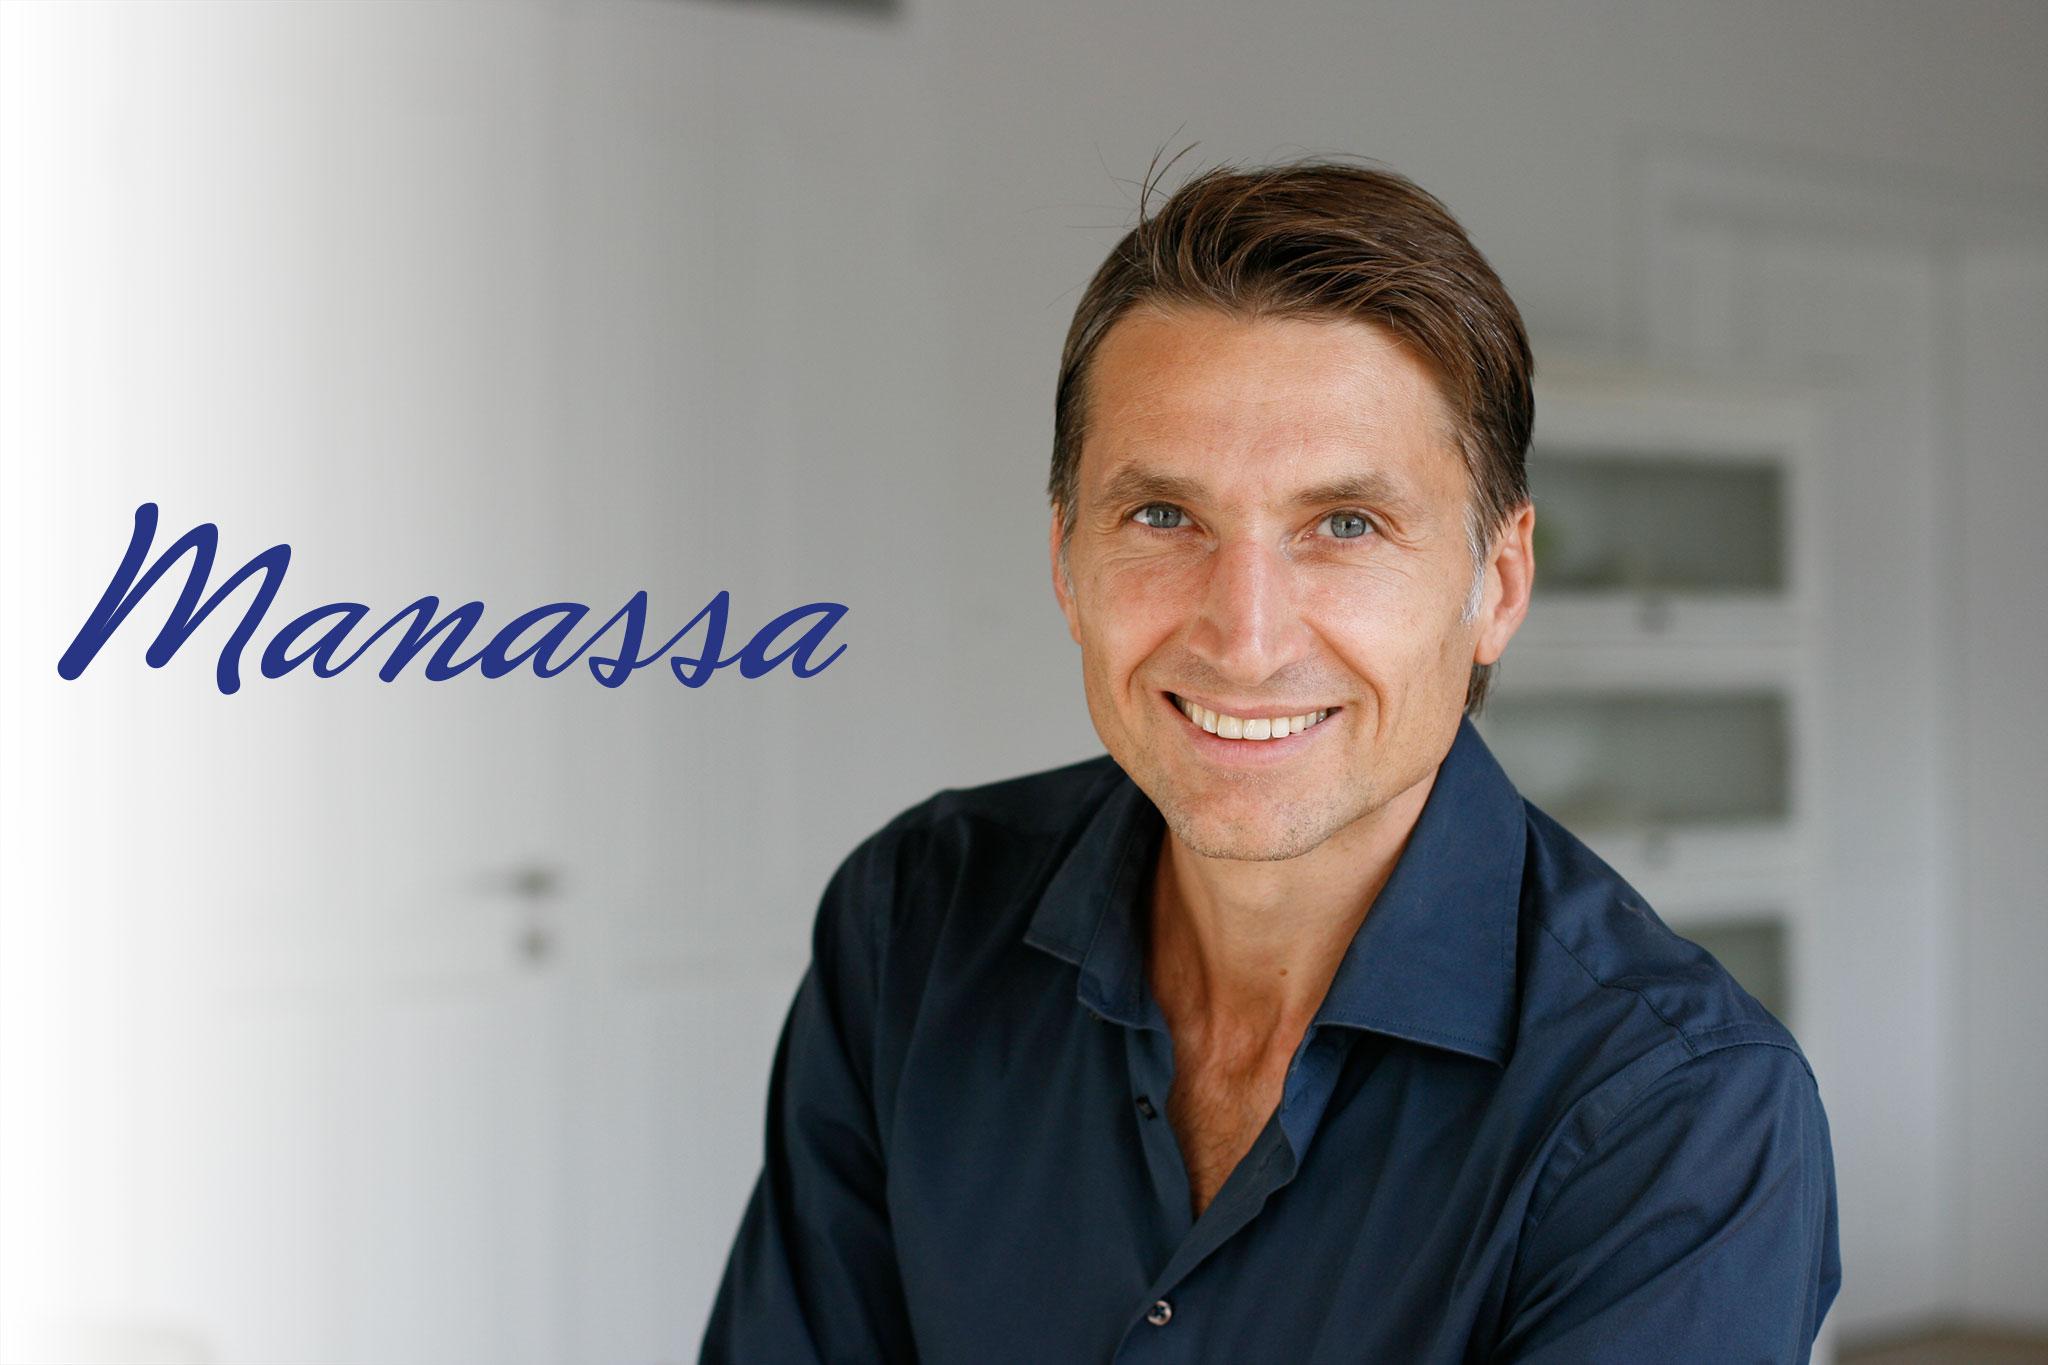 Dr. Edourd Manassa